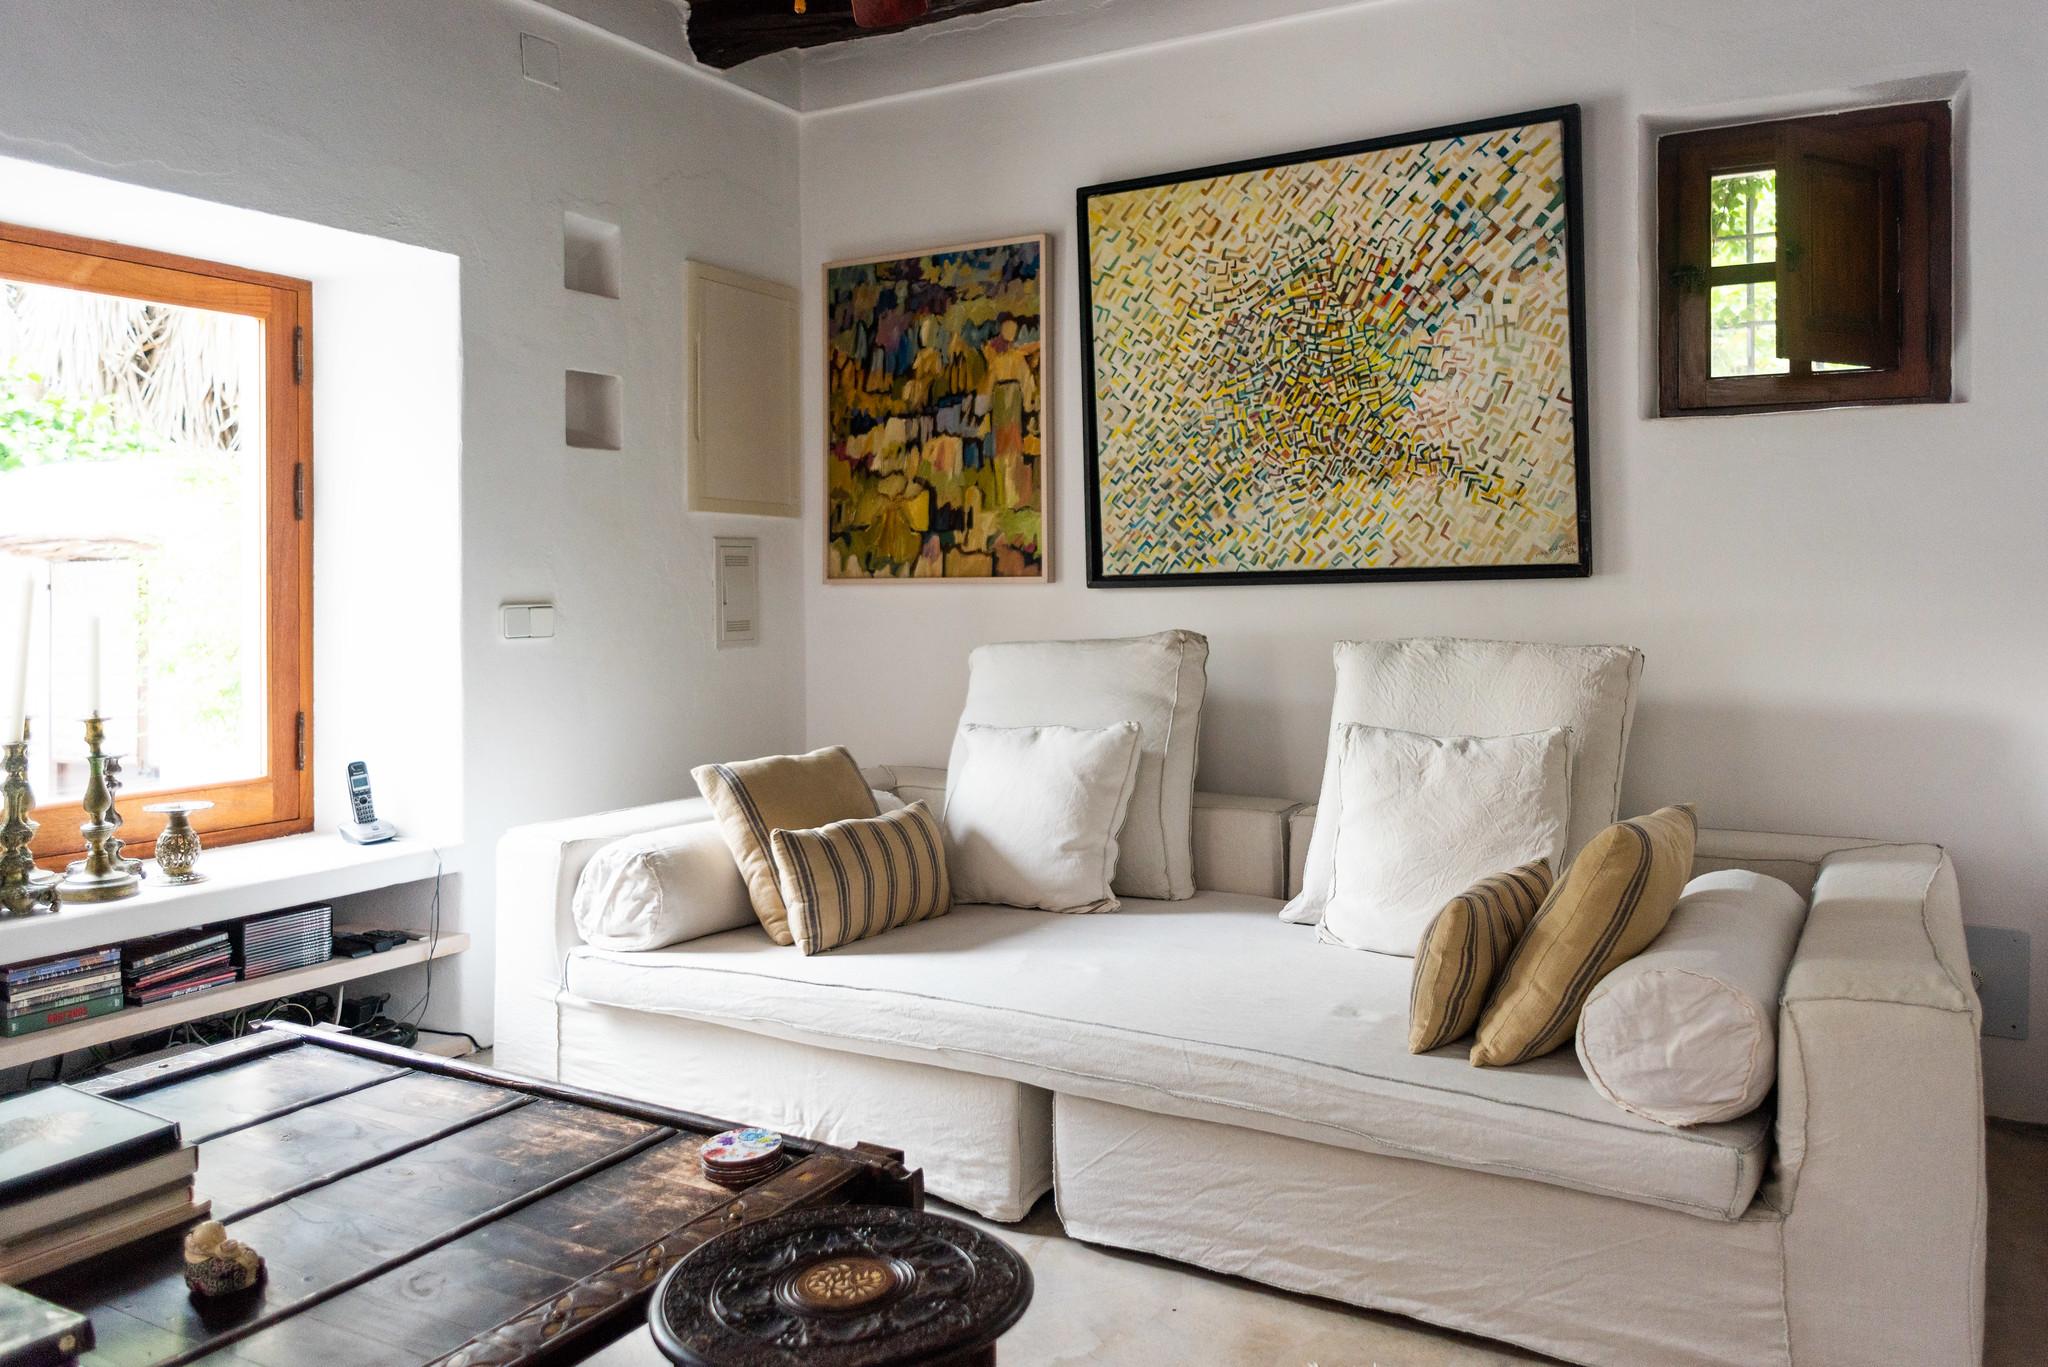 https://www.white-ibiza.com/wp-content/uploads/2020/05/white-ibiza-villas-can-lyra-interior-living-room-sofa.jpg